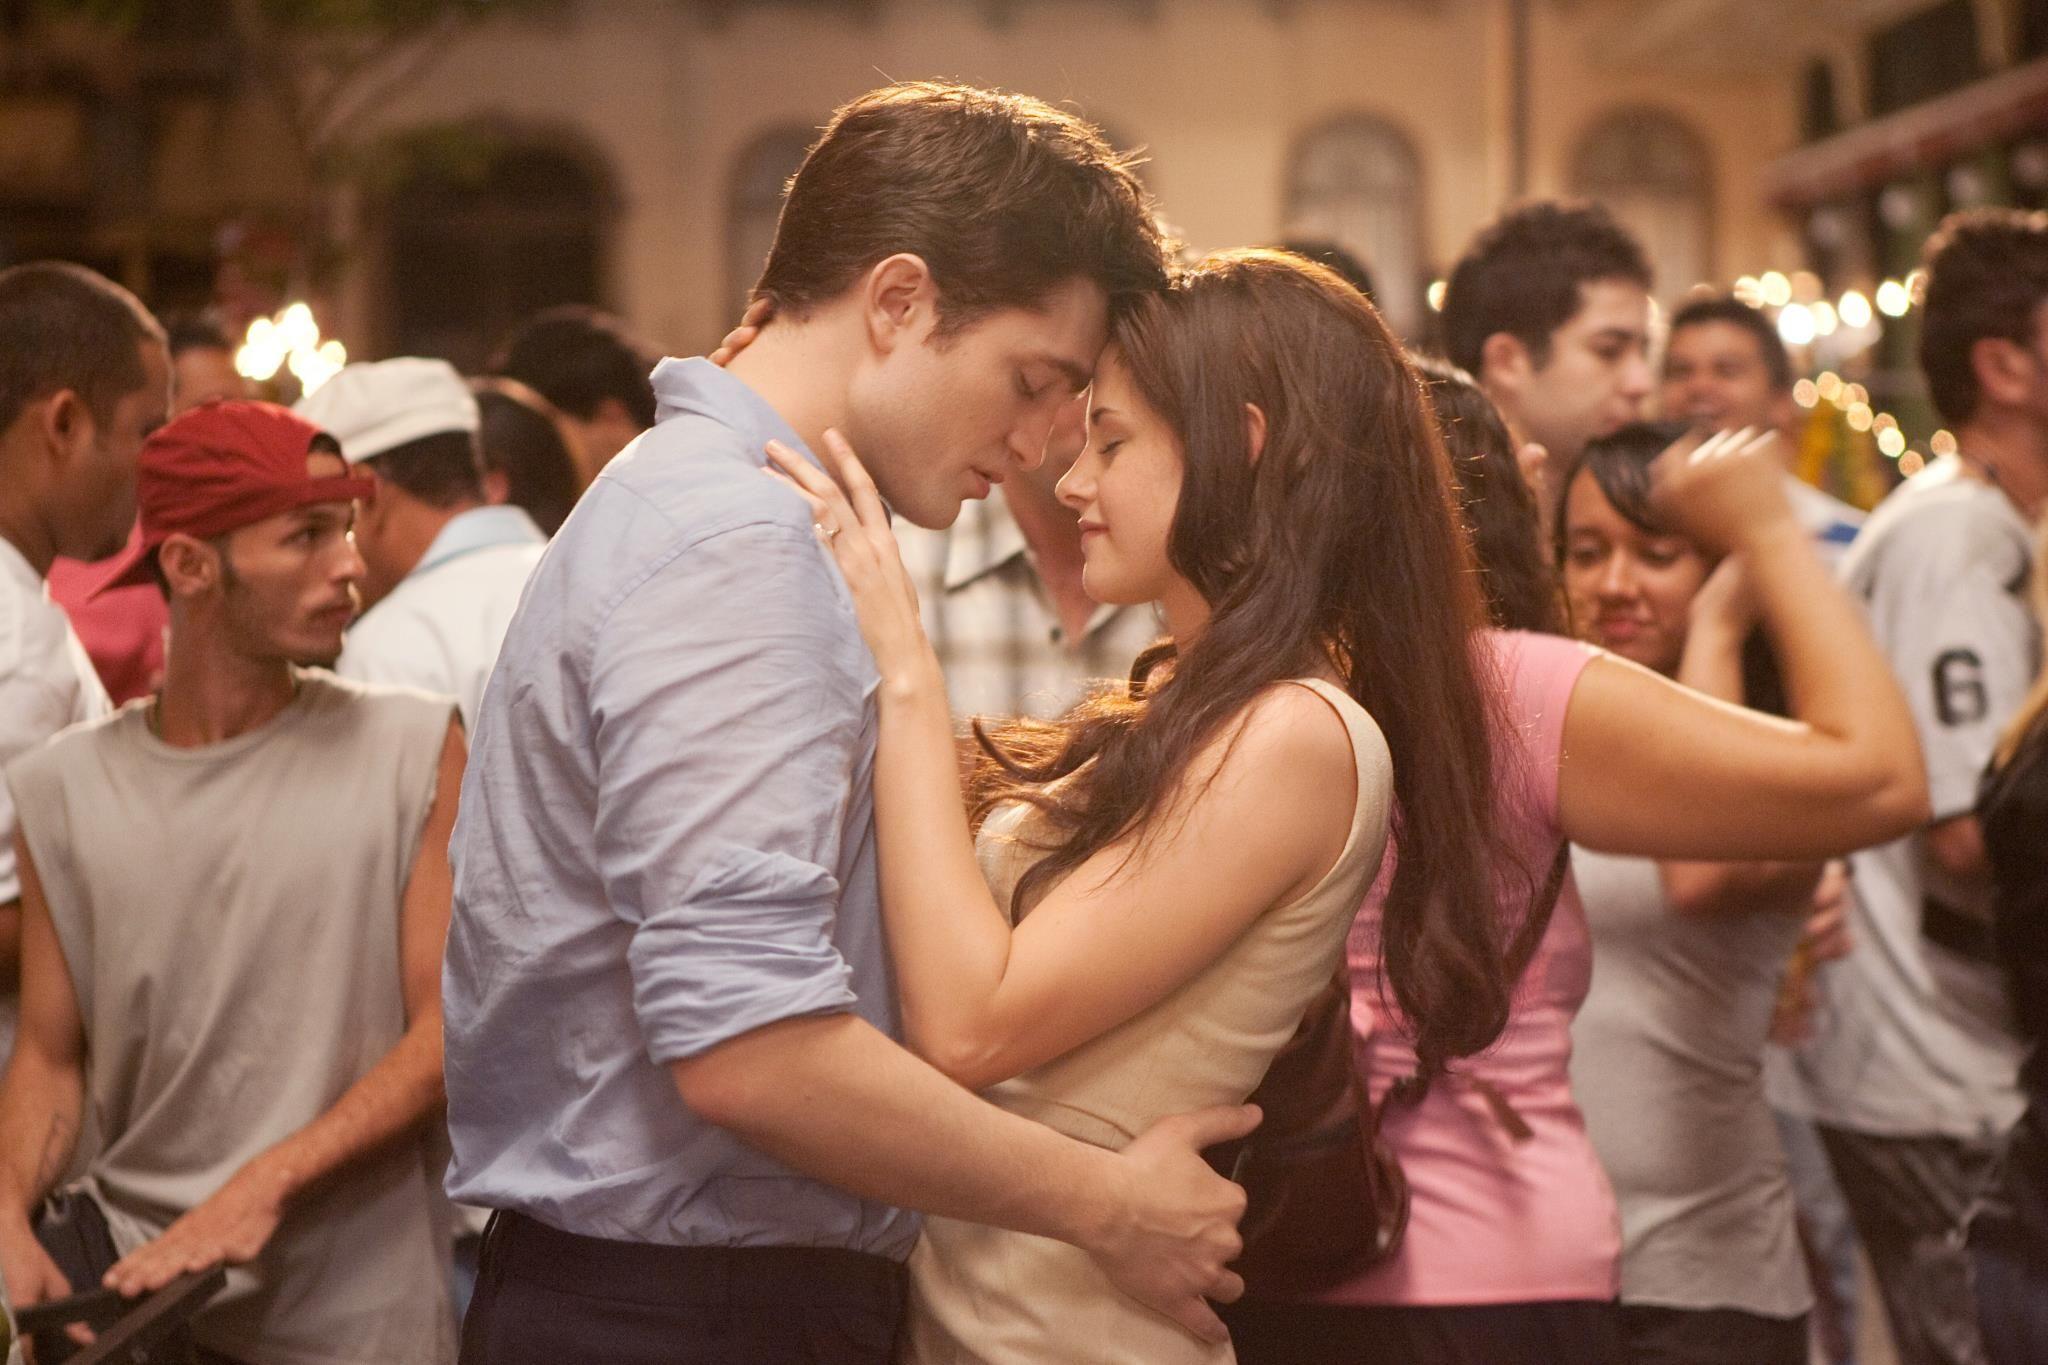 Edward and bella dancing grateful for